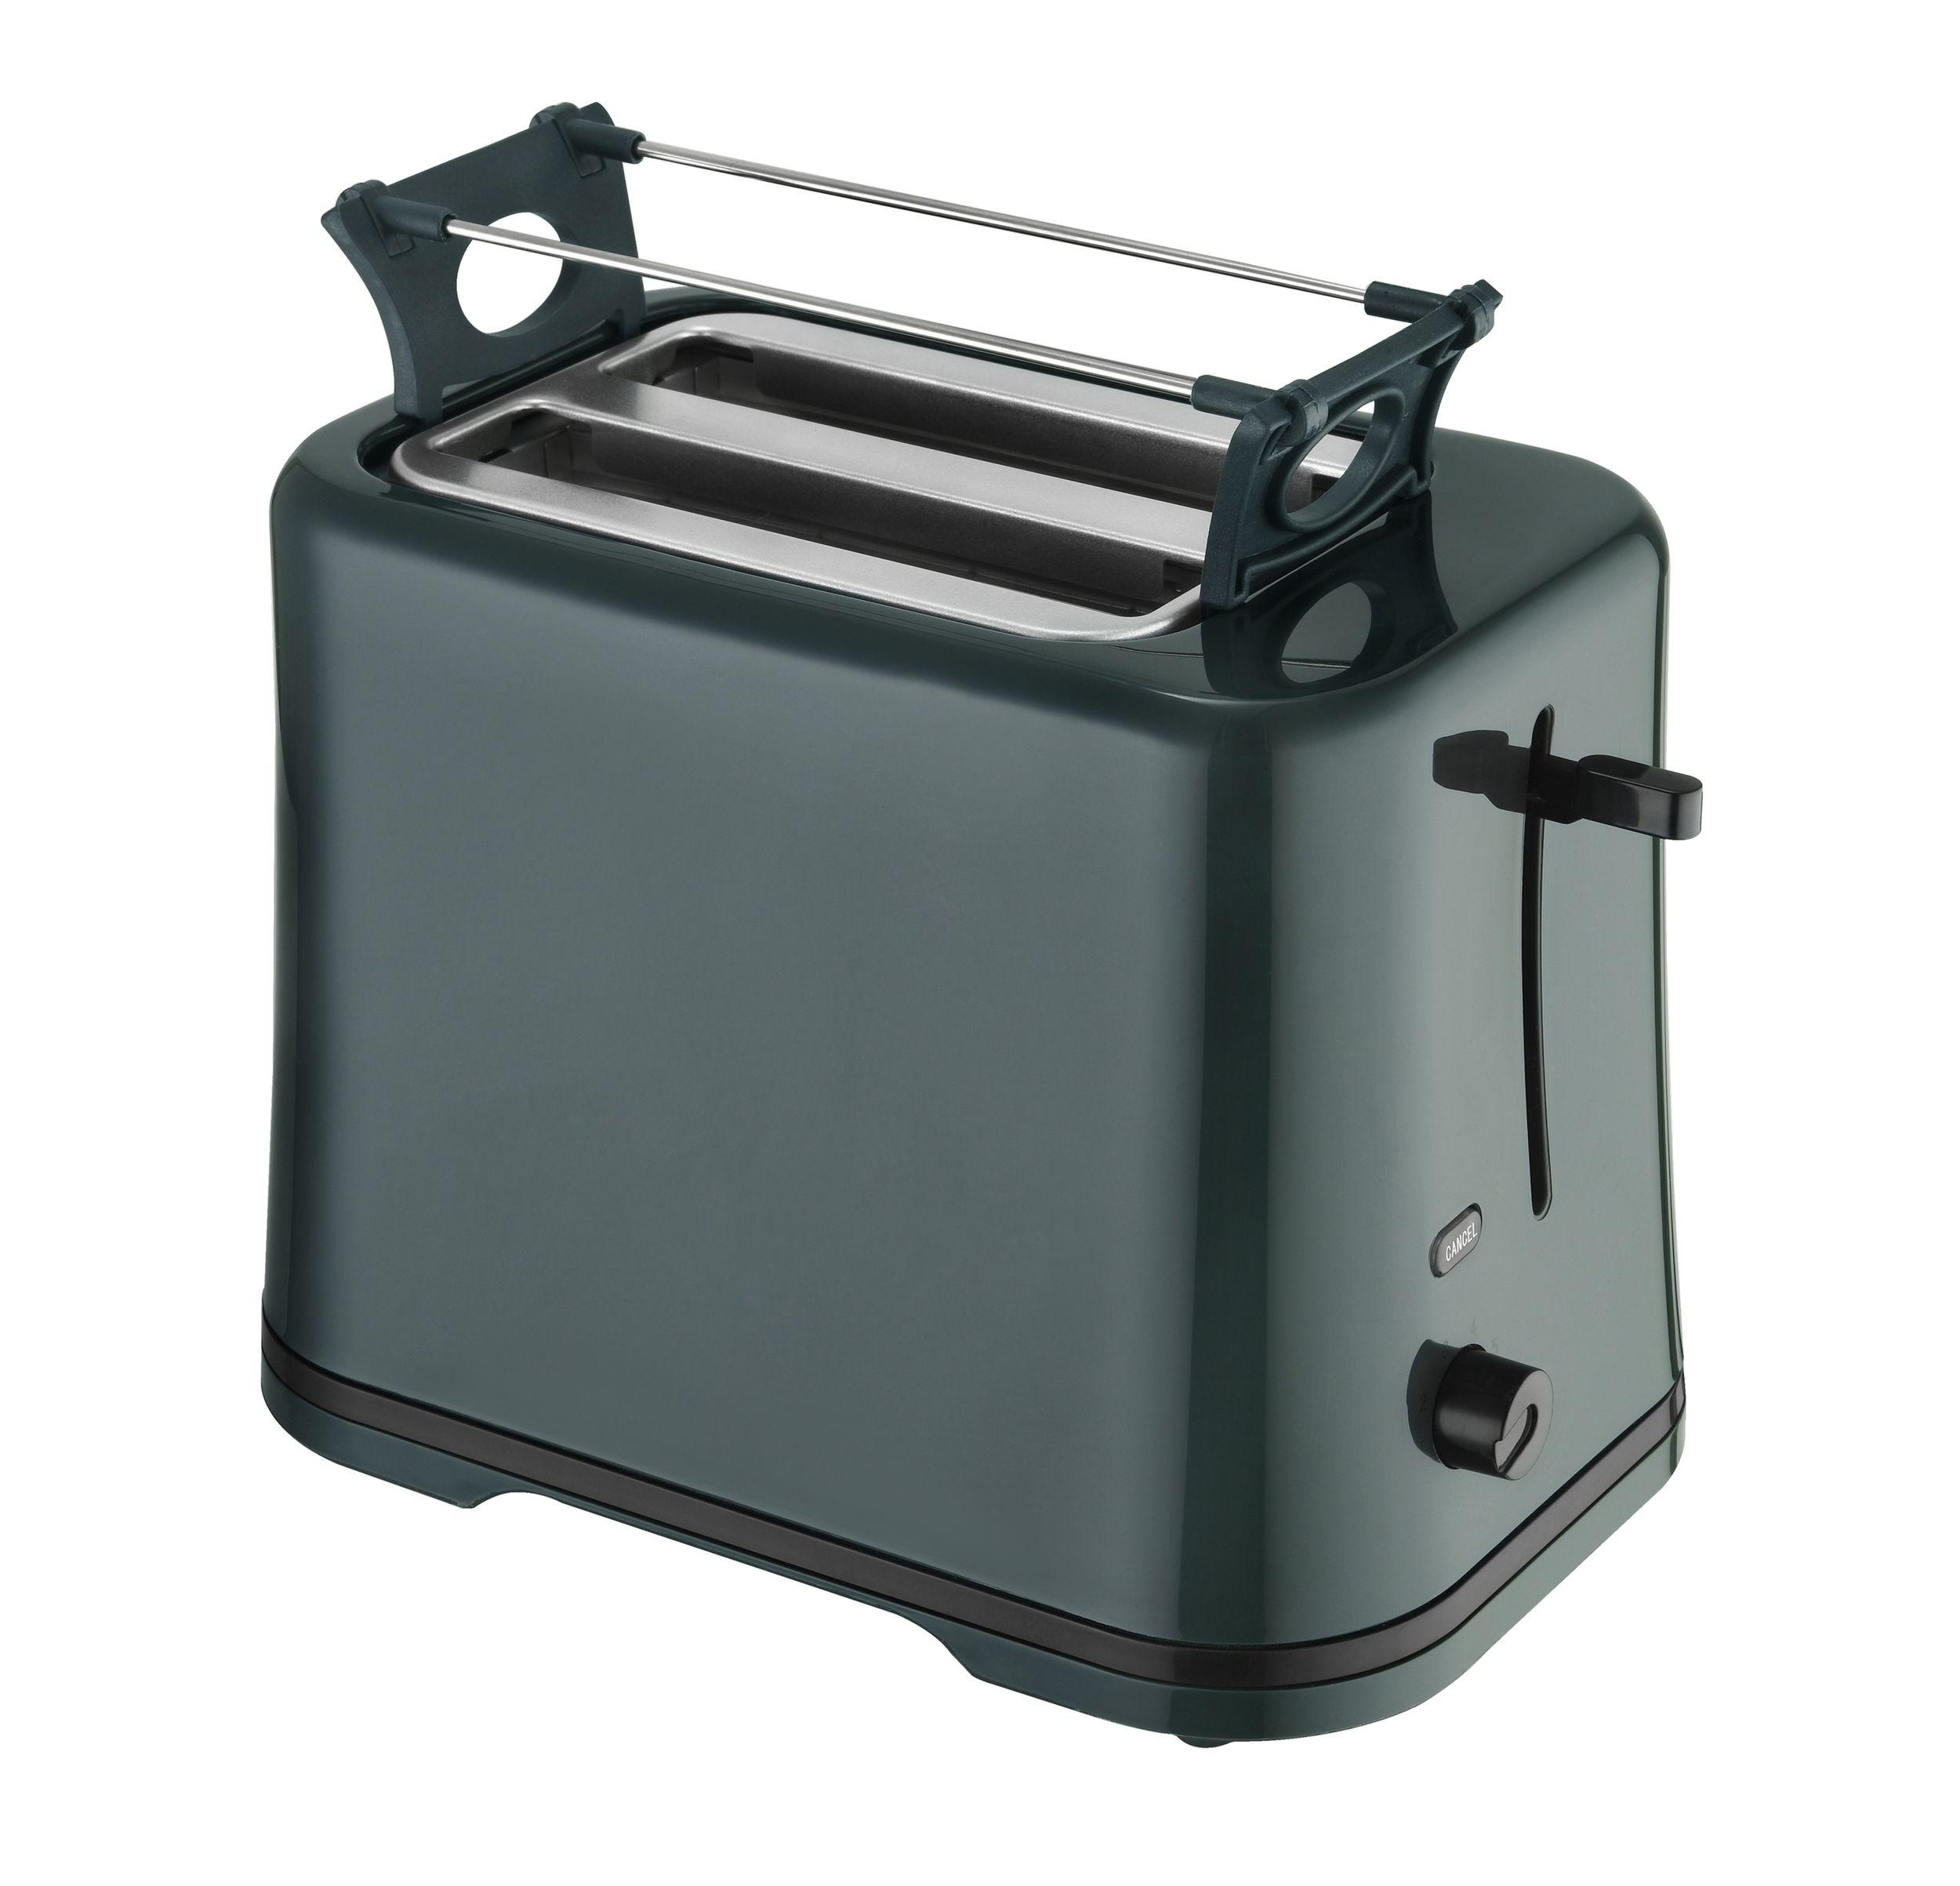 Frühstücksset 3-teilig Toaster Wasserkocher 1 Liter Kaffeemaschine 1,25 Liter Dunkelgrün Bild 3